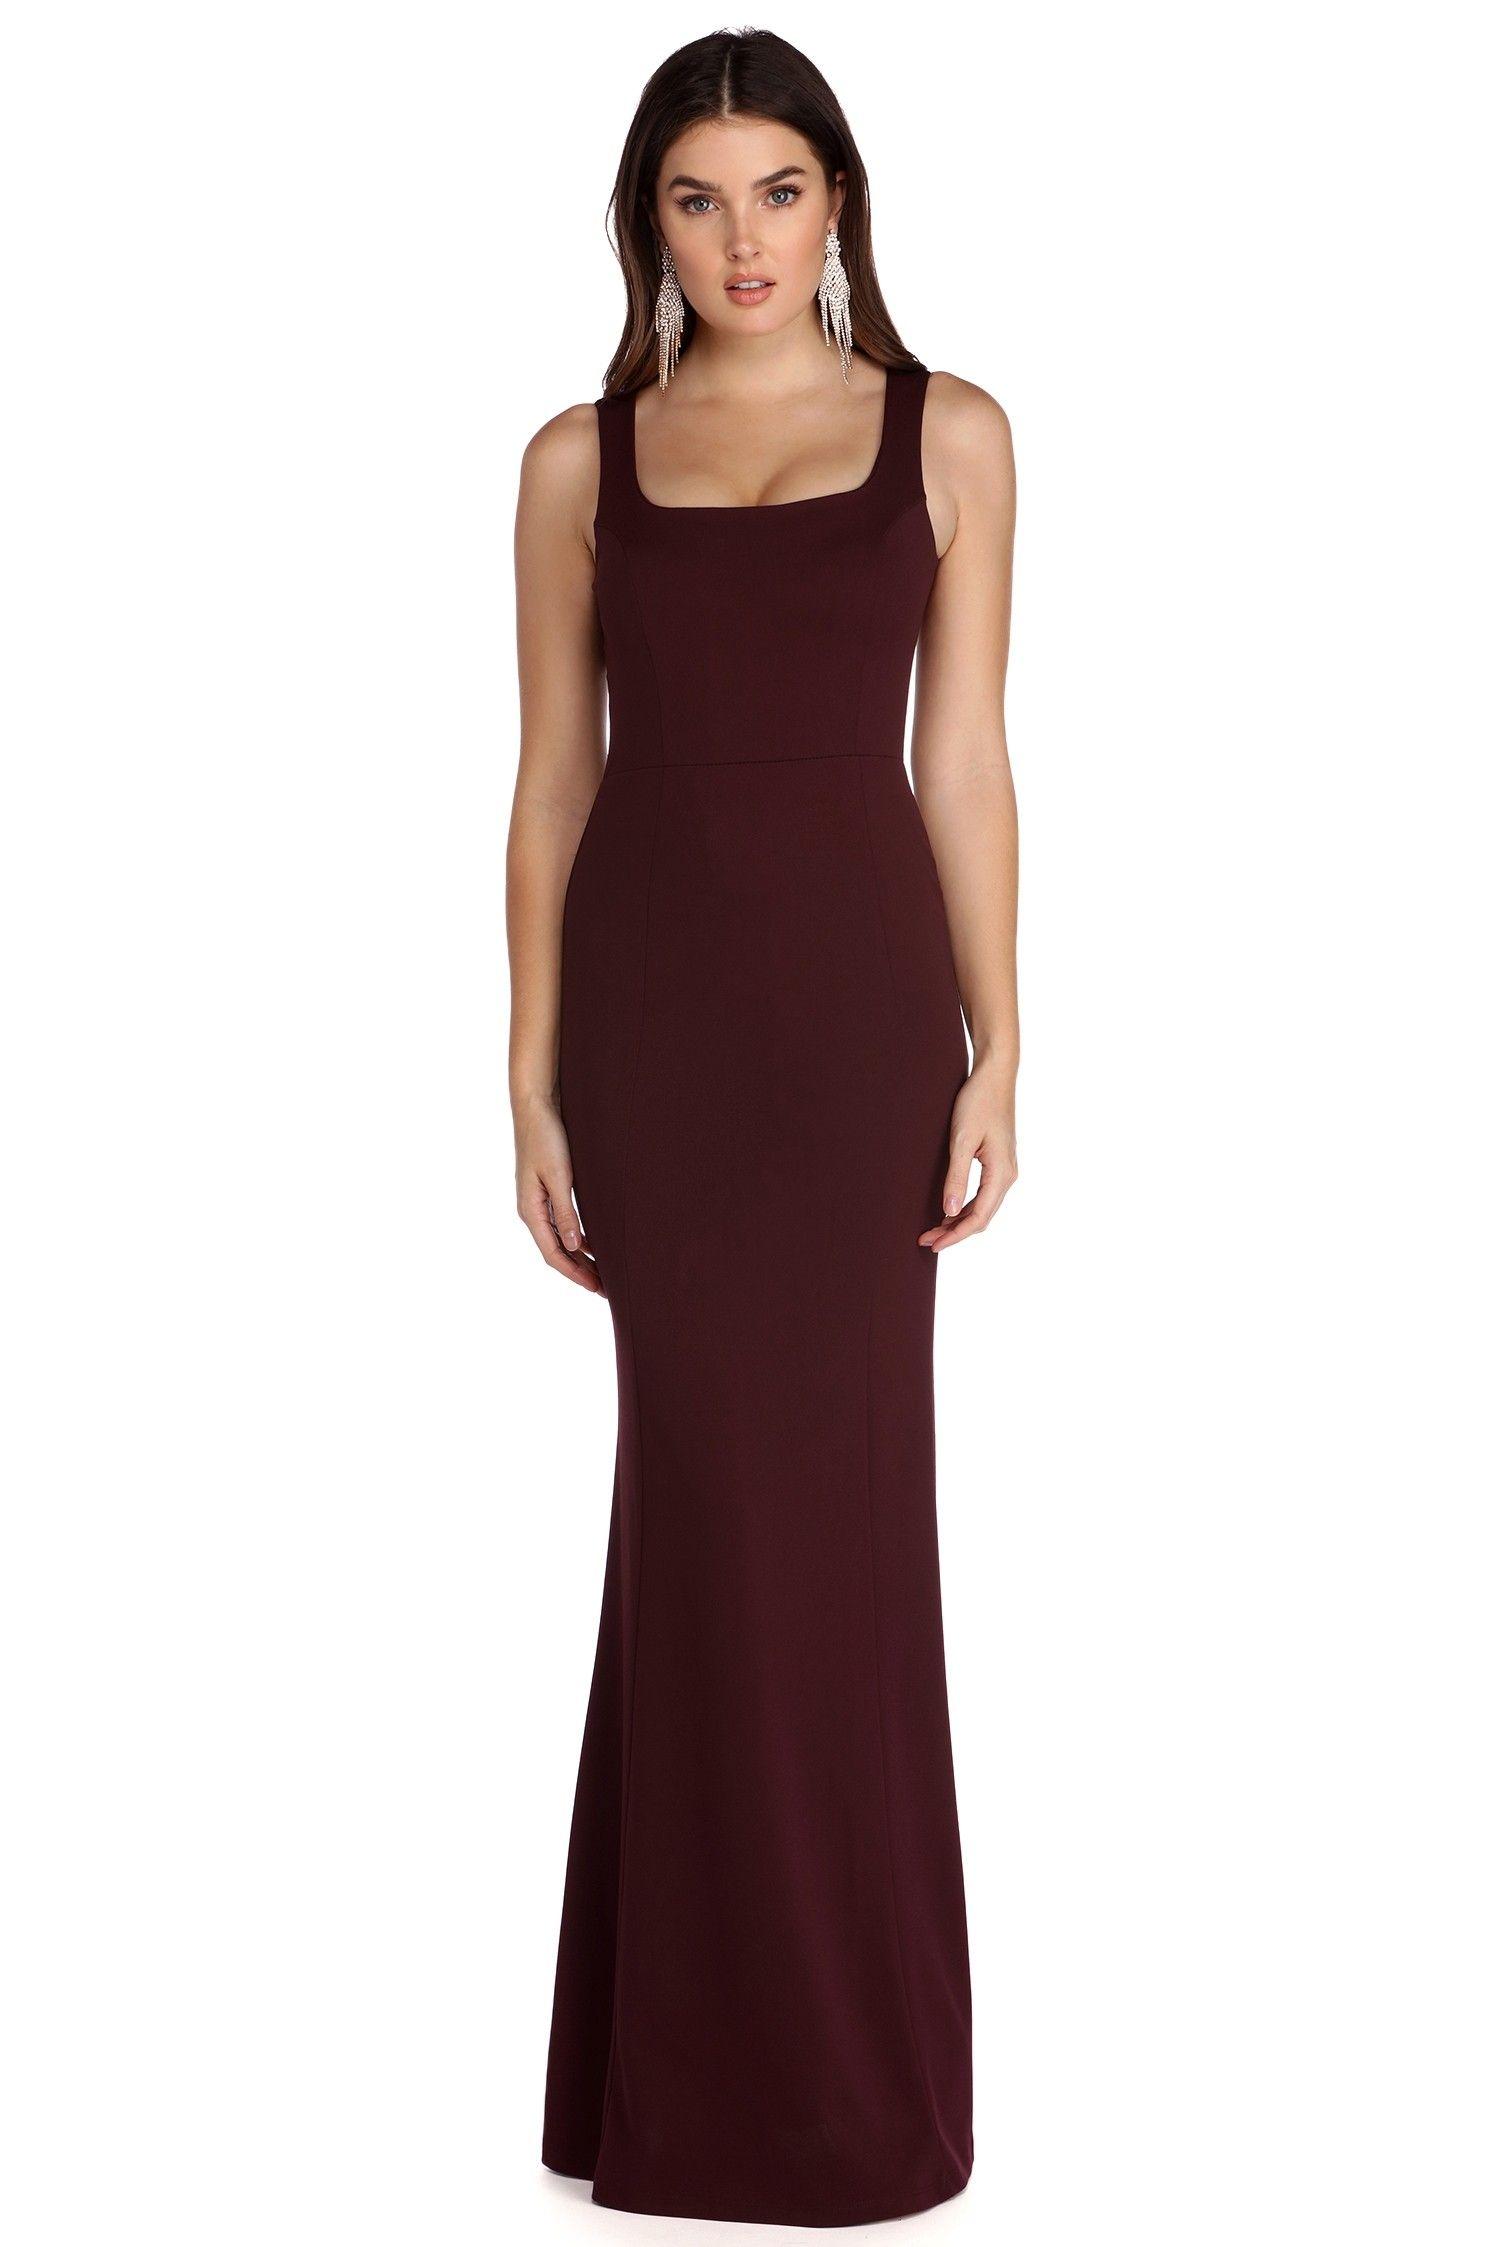 Final sale zayla burgundy wine not dress events u parties